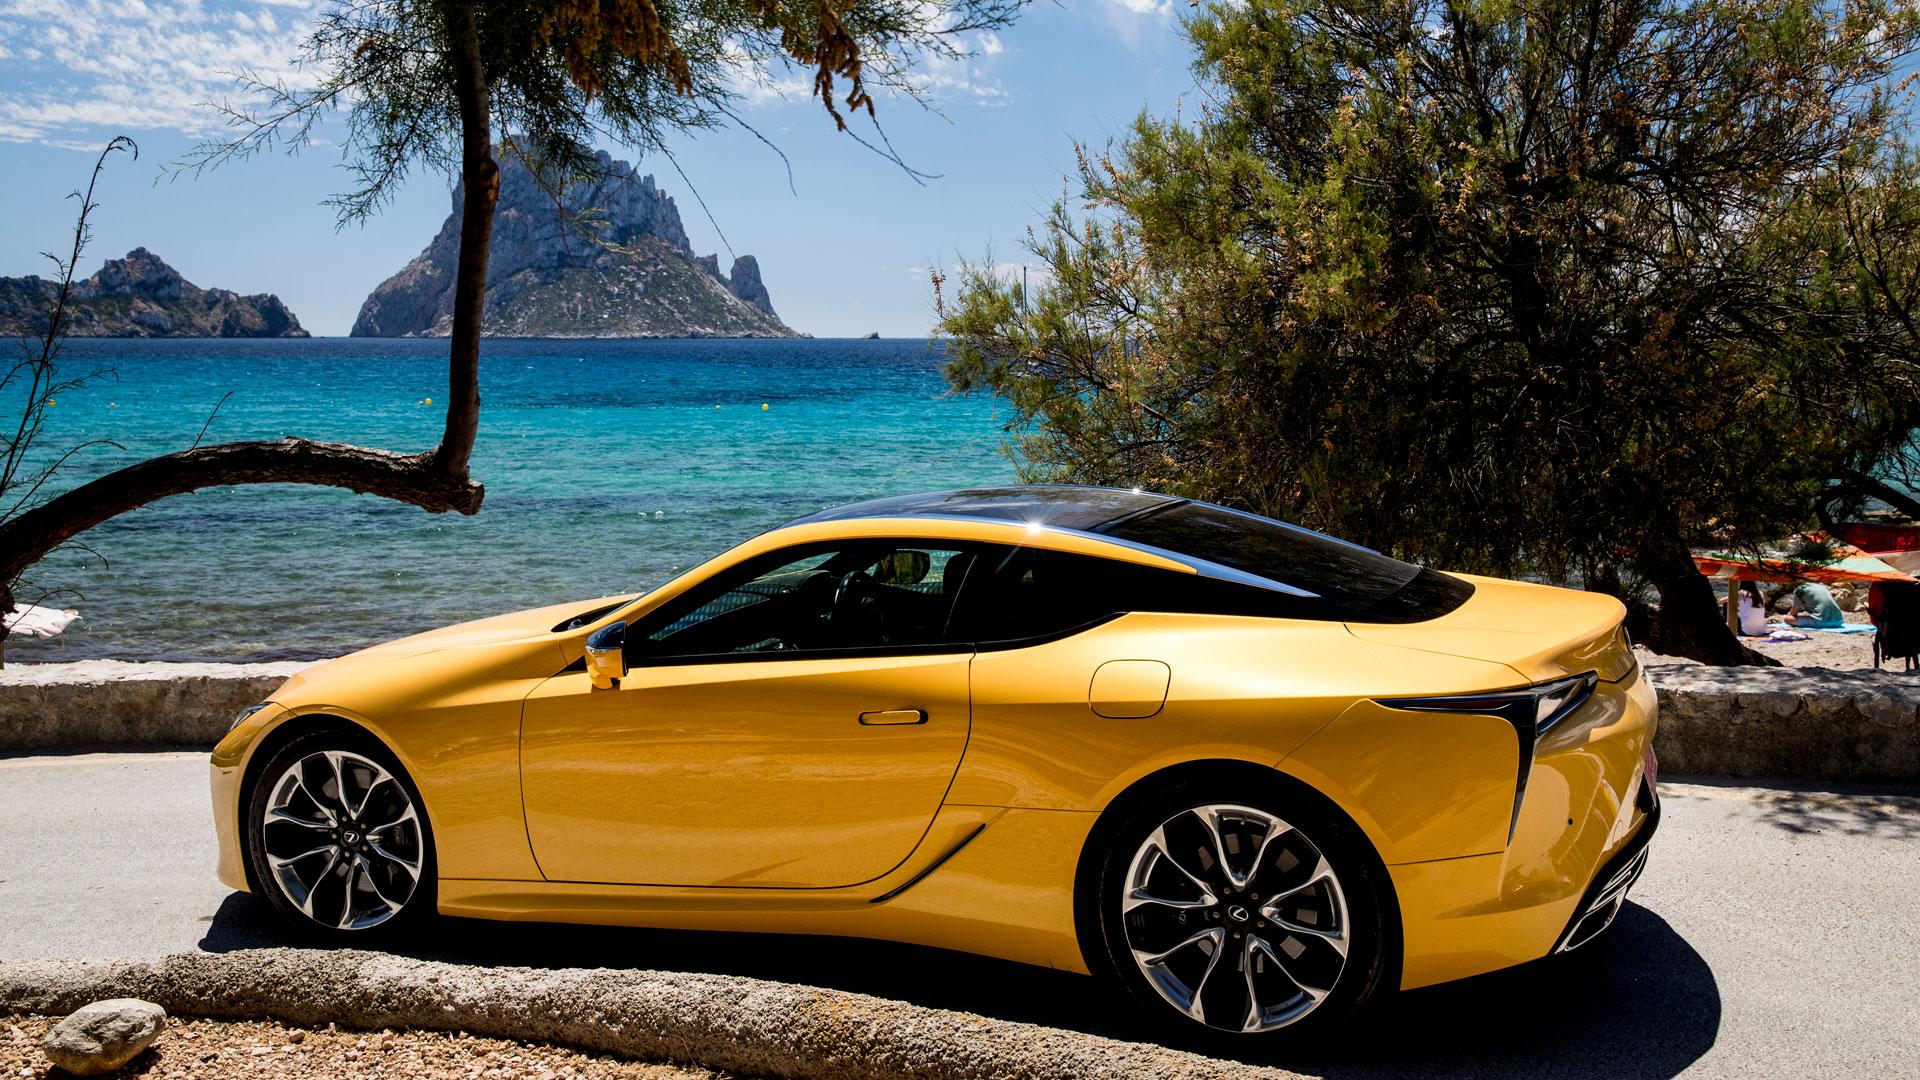 Lexus LC 500h Yellow Edition hero asset